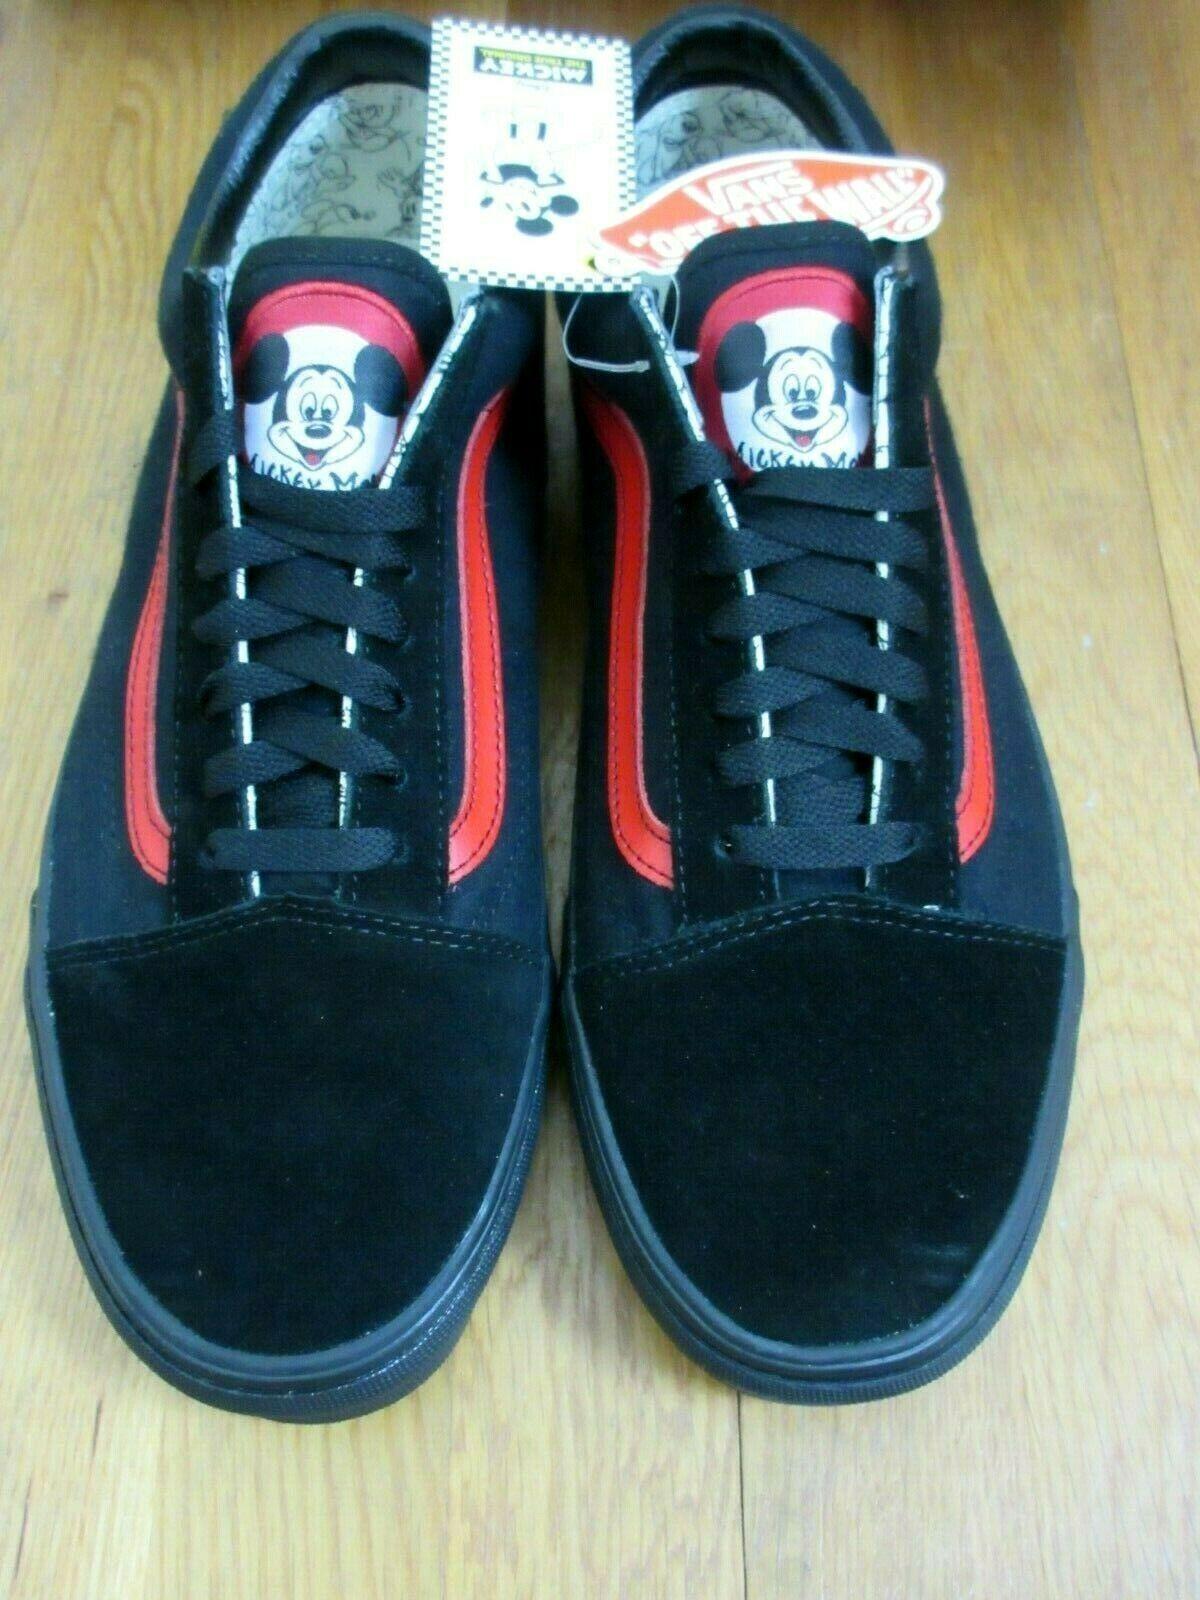 Vans X Disney Mens Old Skool Mickey Mouse Club Skate shoes Black Red Size 10.5